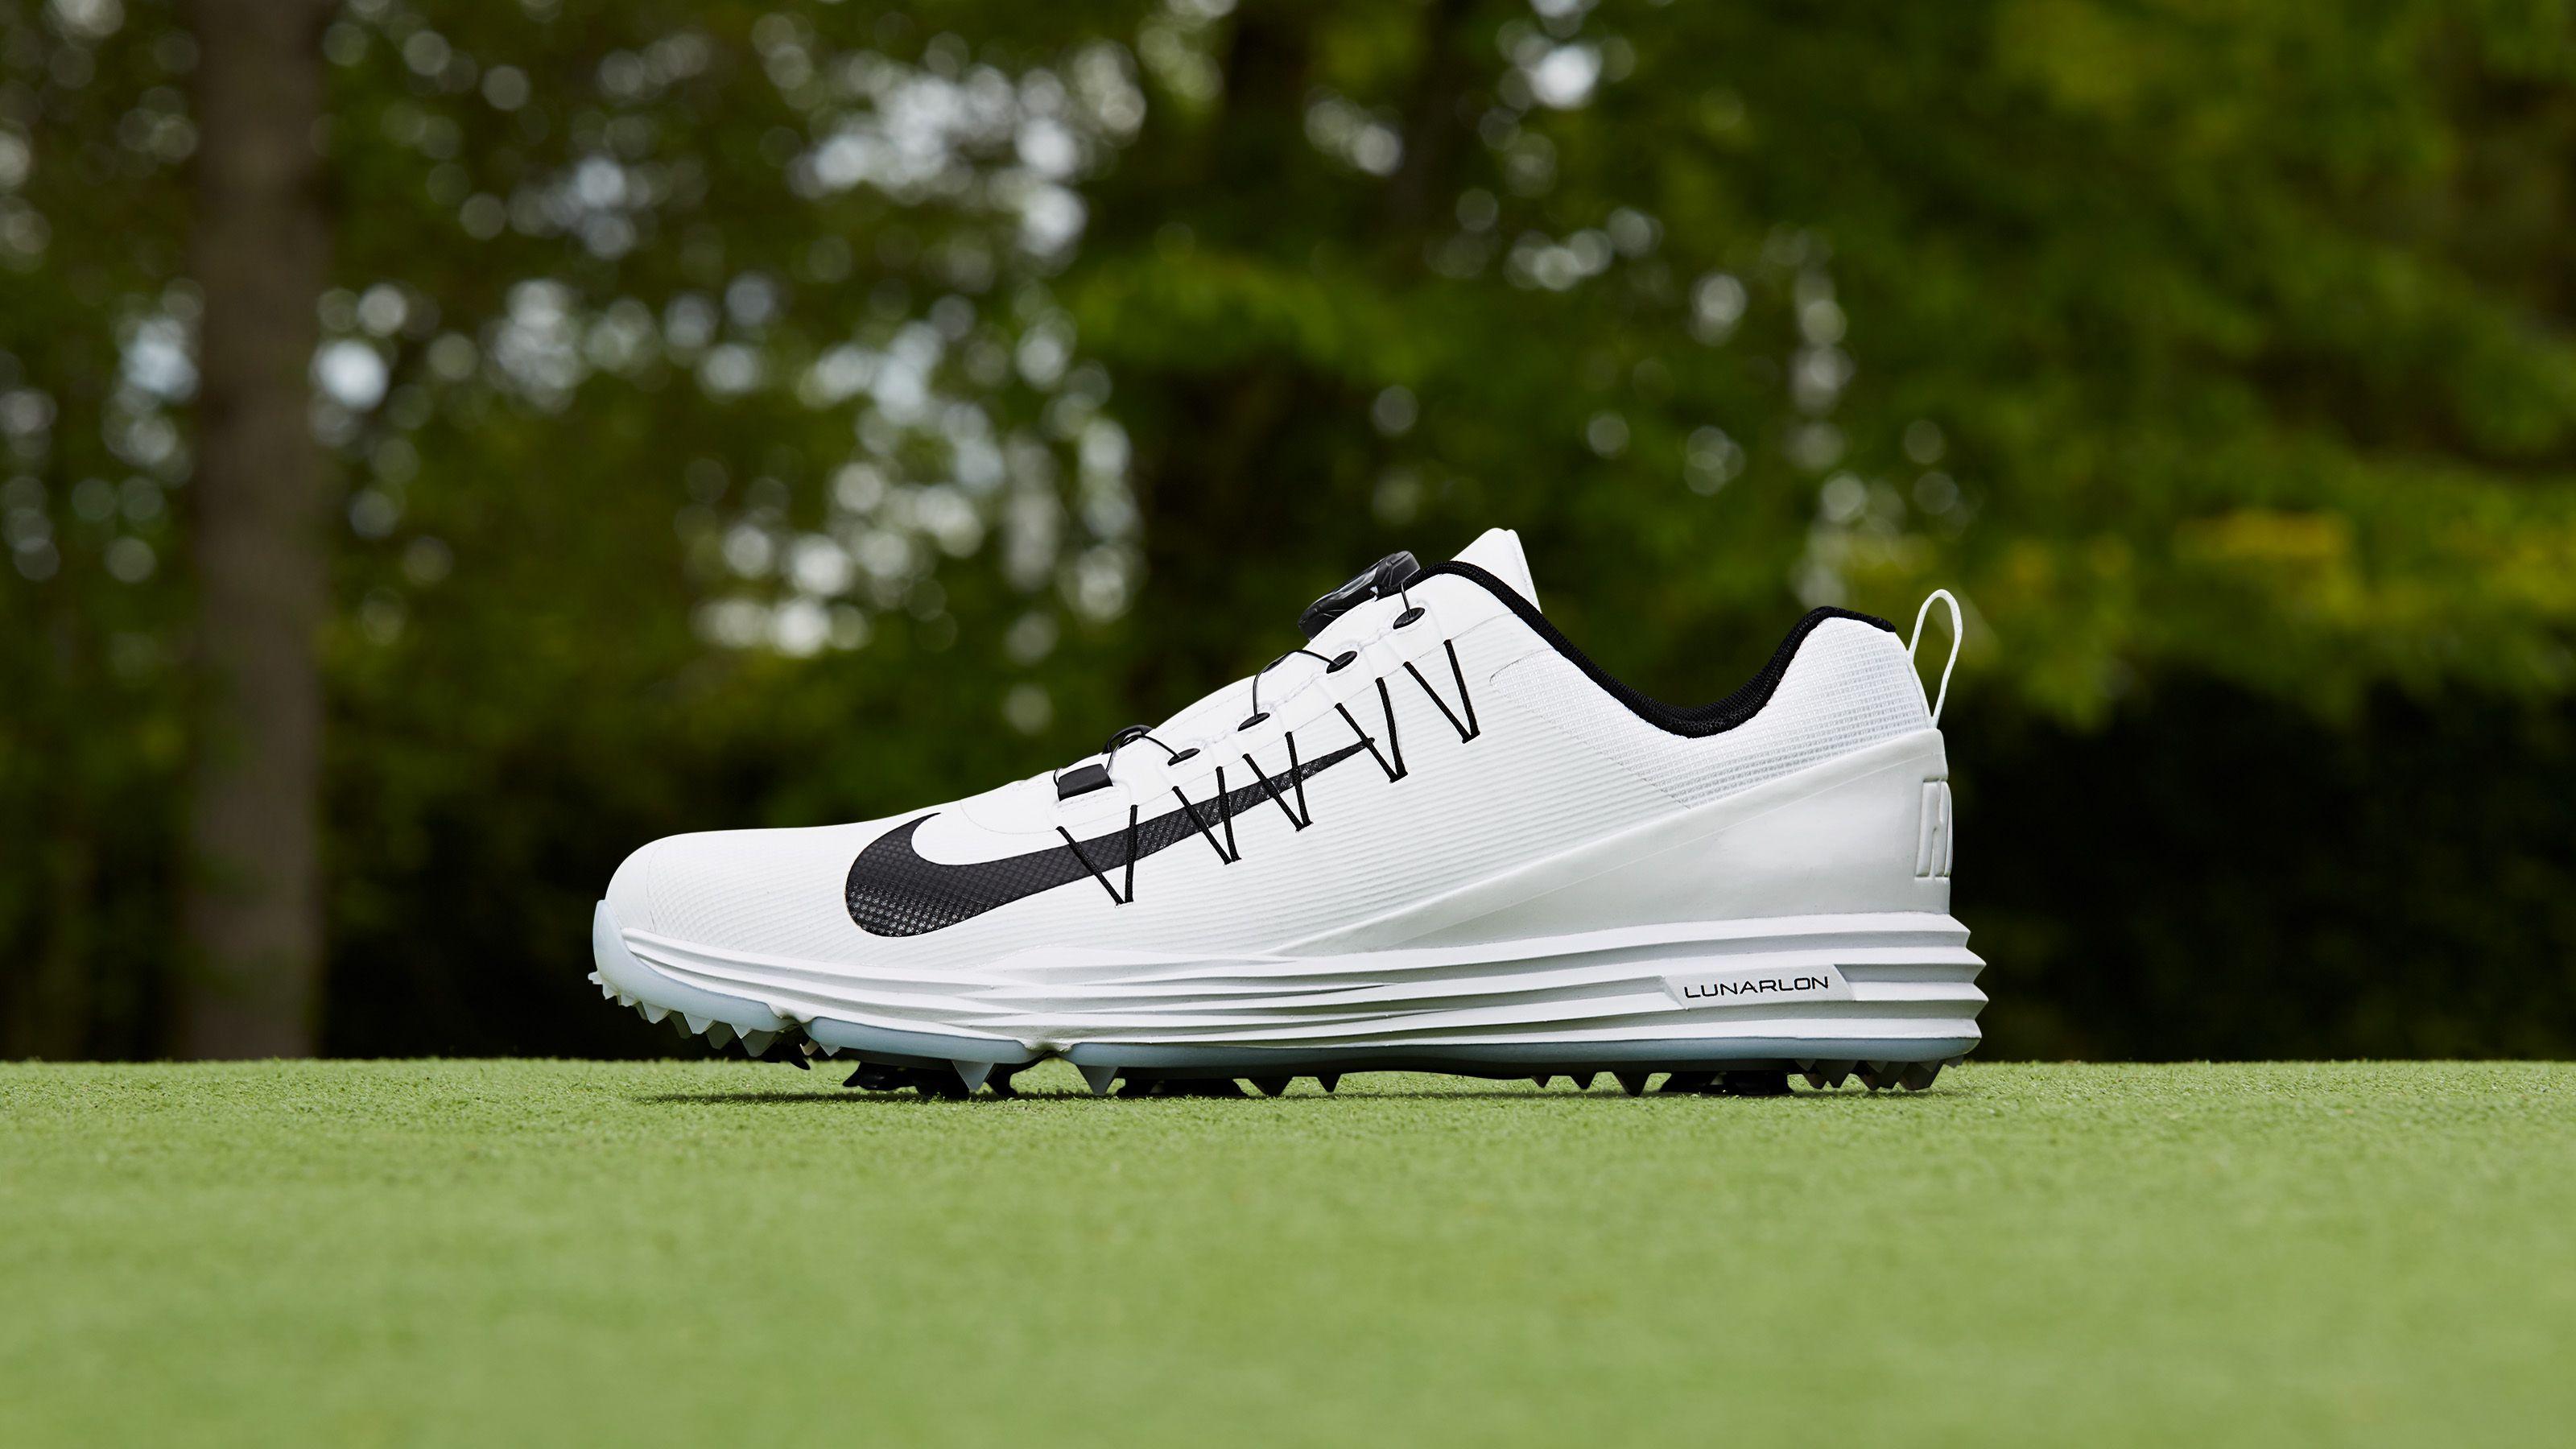 Nike Golf- Lunar Command 2 Shoes   The Links   Nike golf, Nike, Nike ... ebf31789283